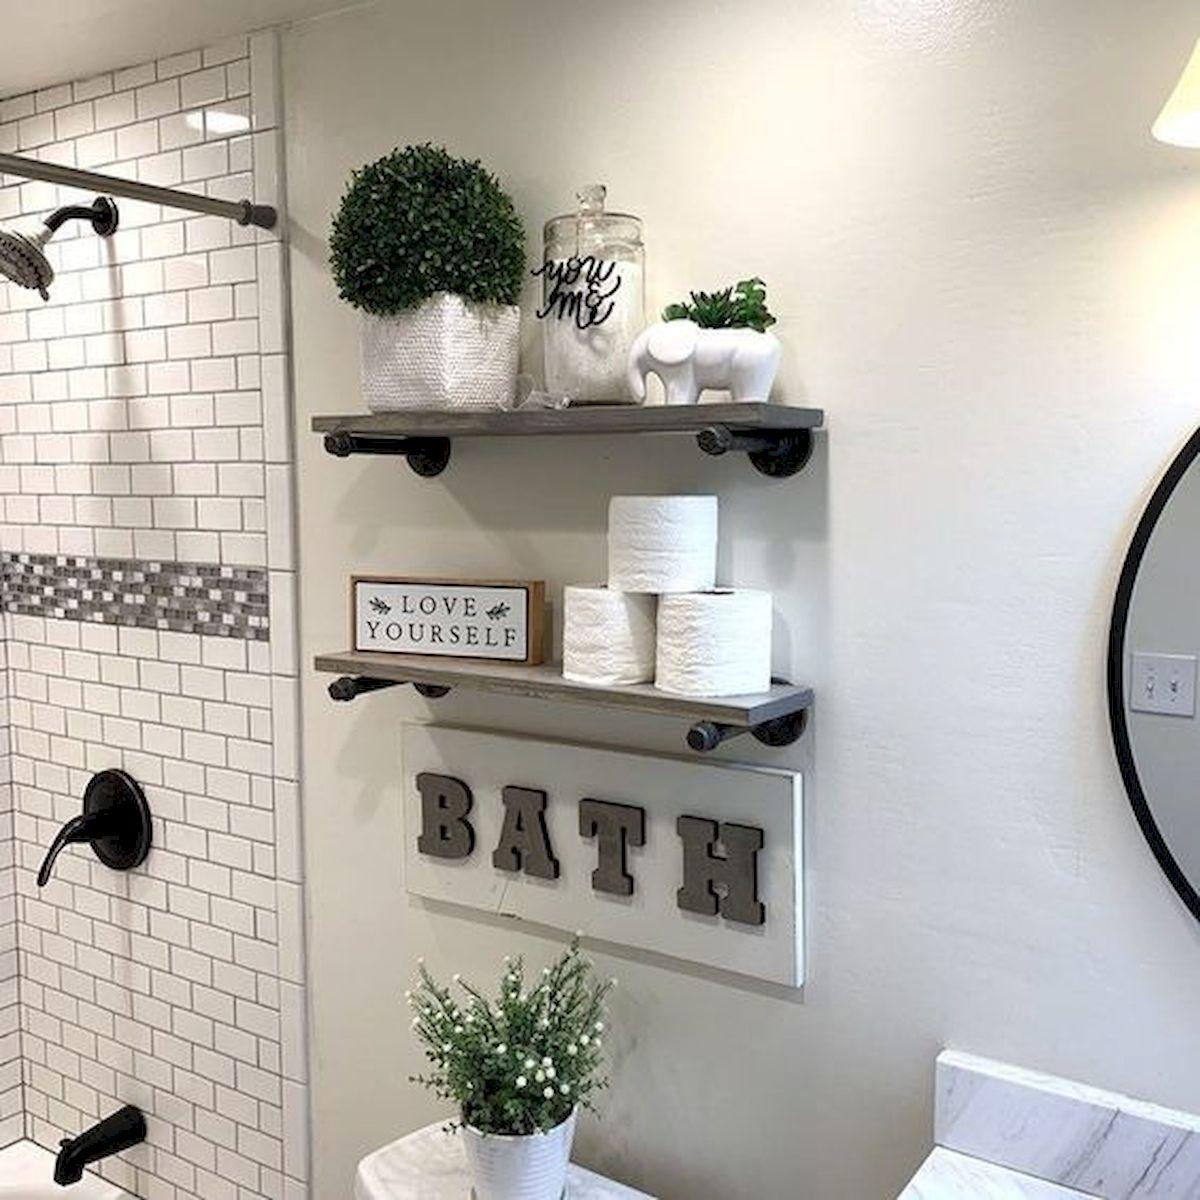 30 Awesome Fall Bathroom Decorating Ideas (18)